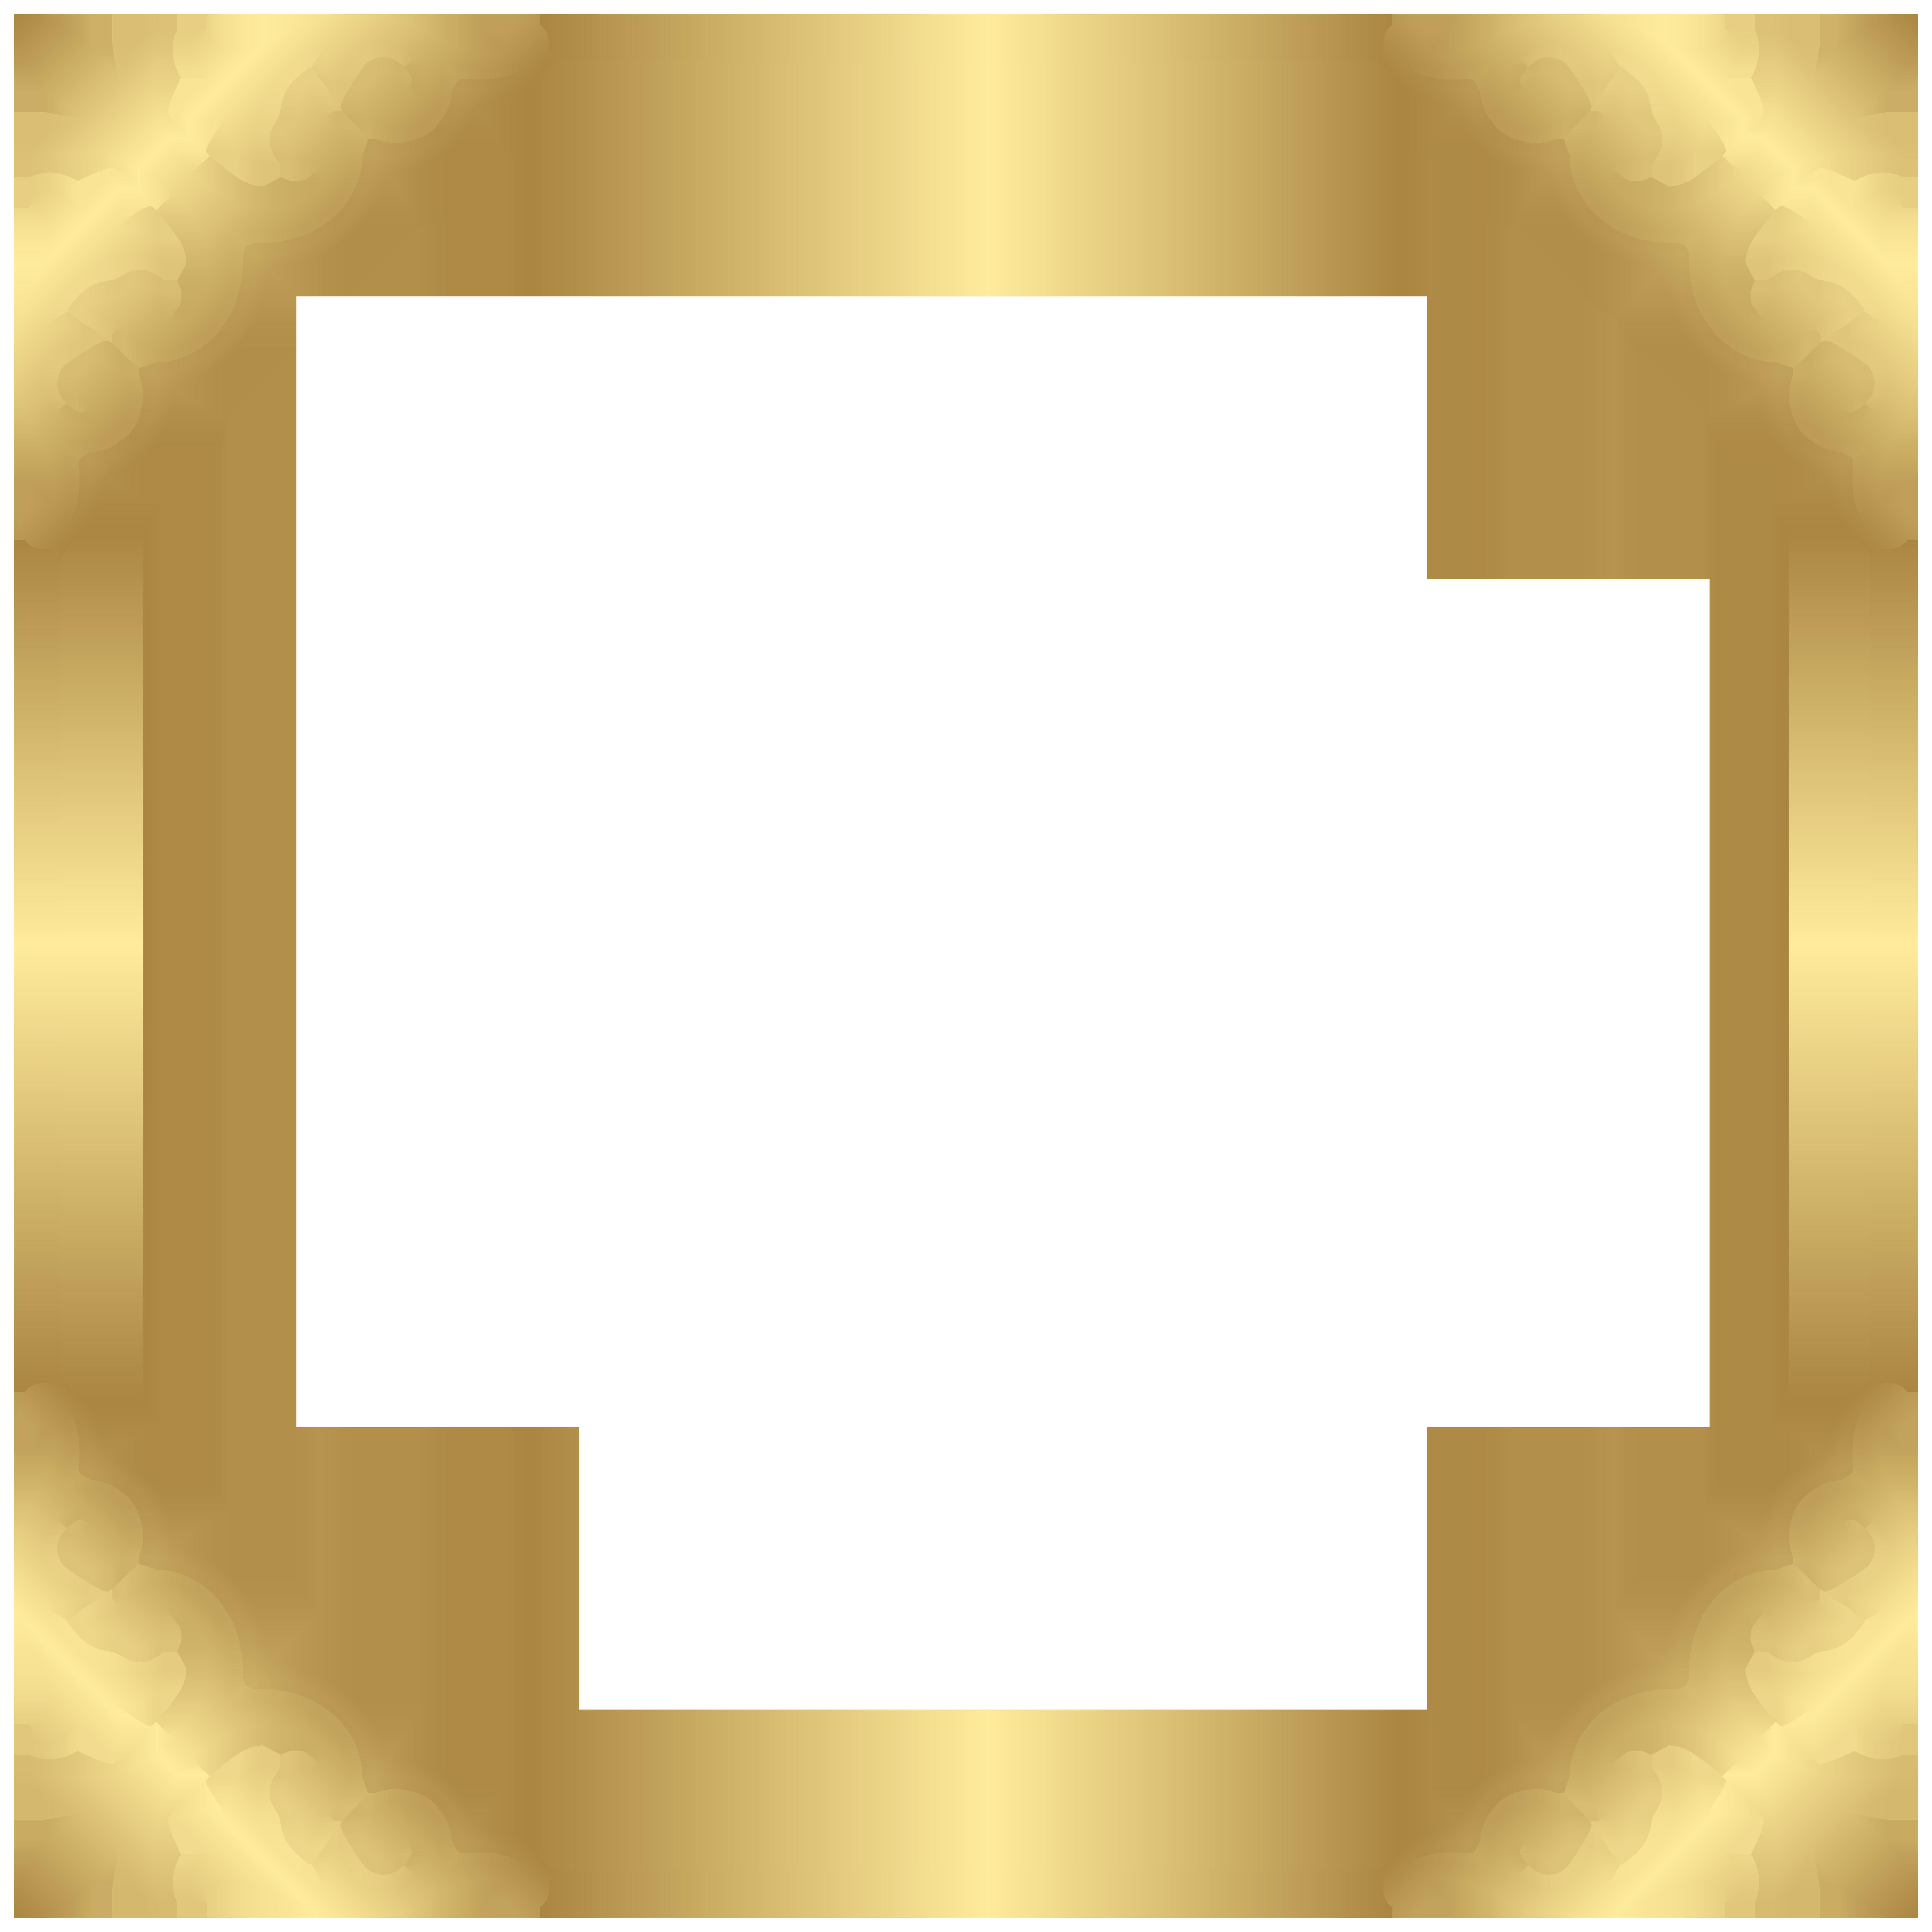 Clipart lovely frame clip. Gold border png